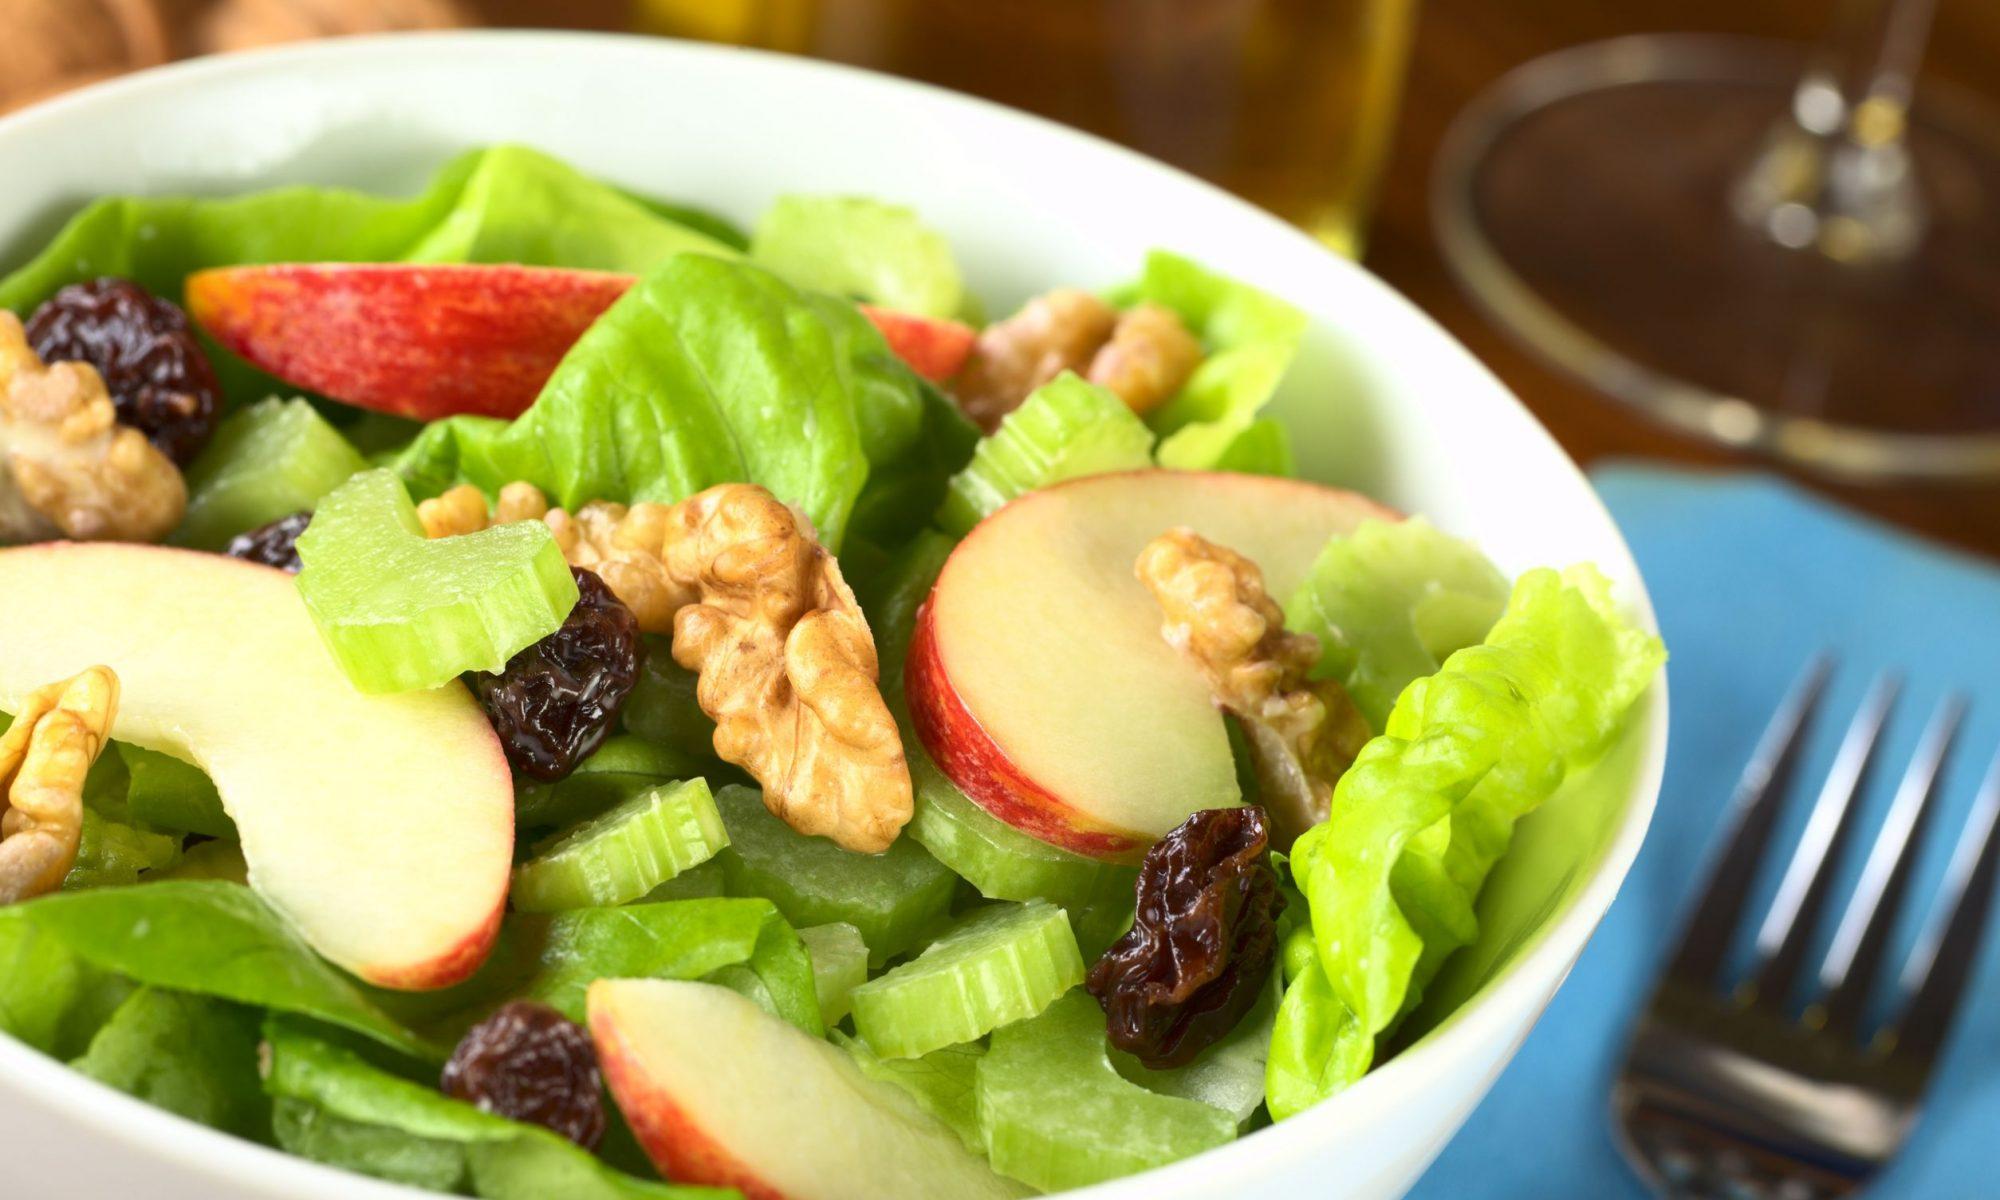 Салат из яблок и грецких орехов